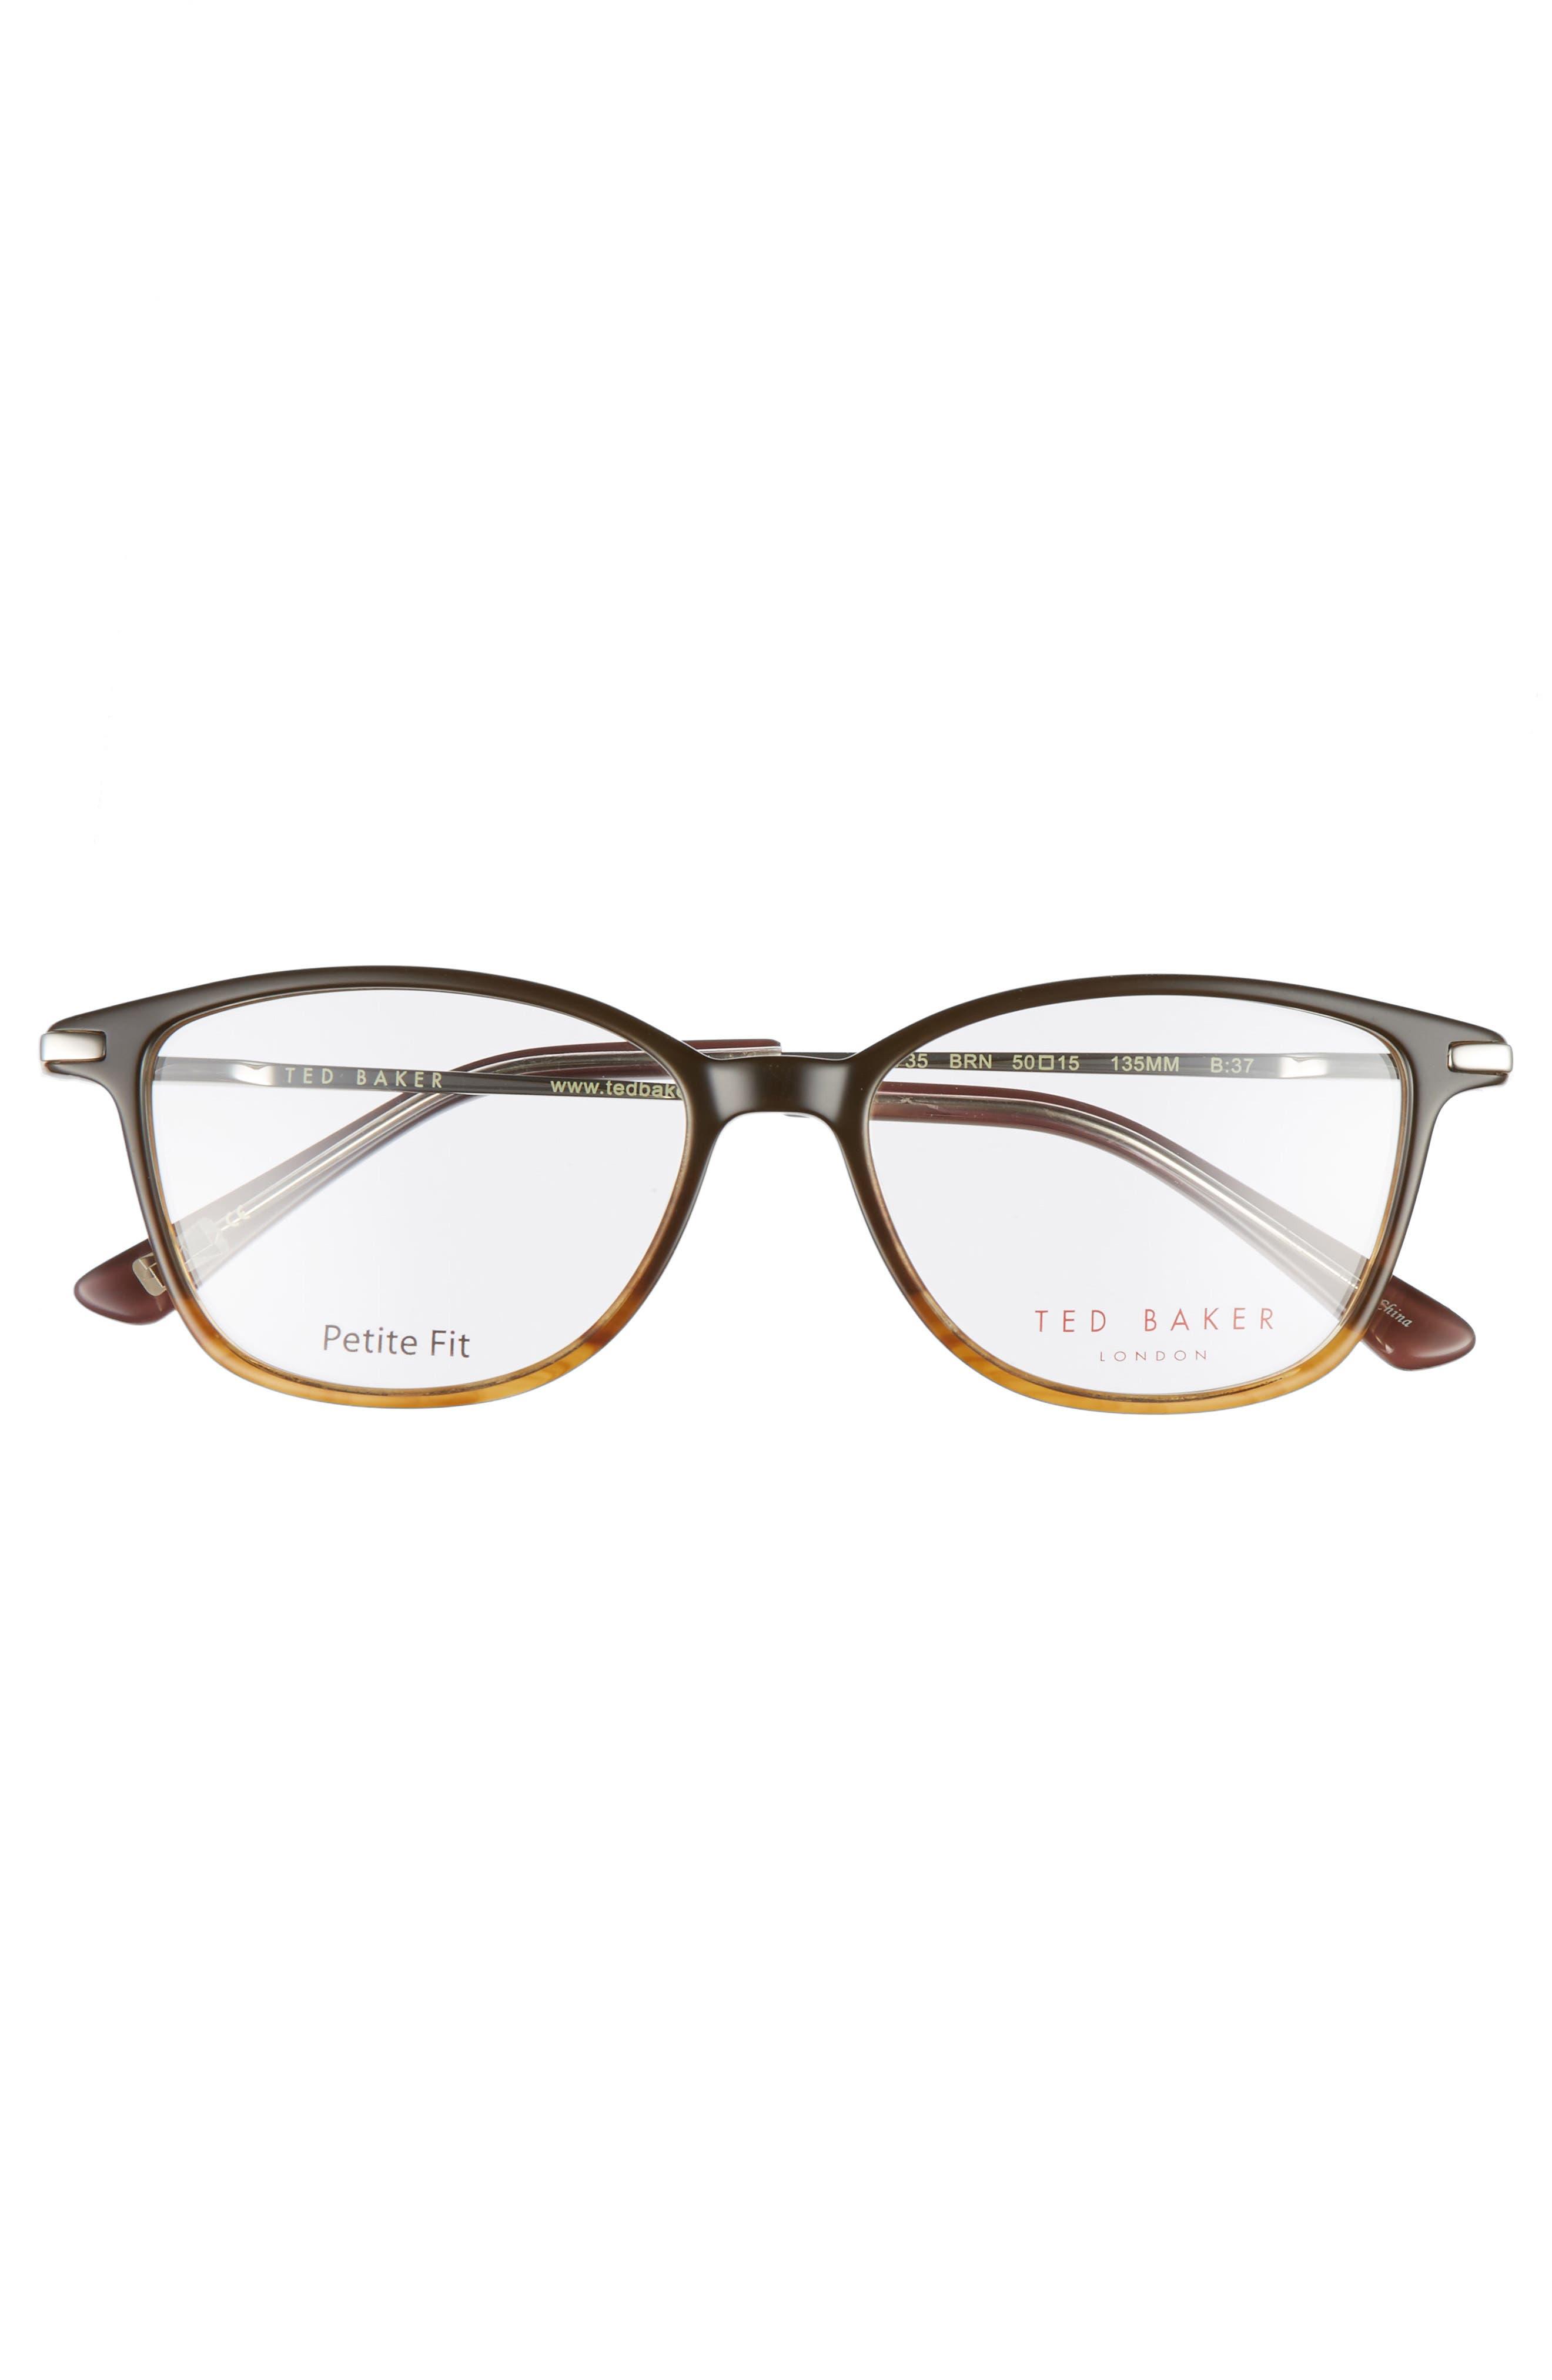 Alternate Image 3  - Ted Baker London Petite Fit 50mm Optical Glasses